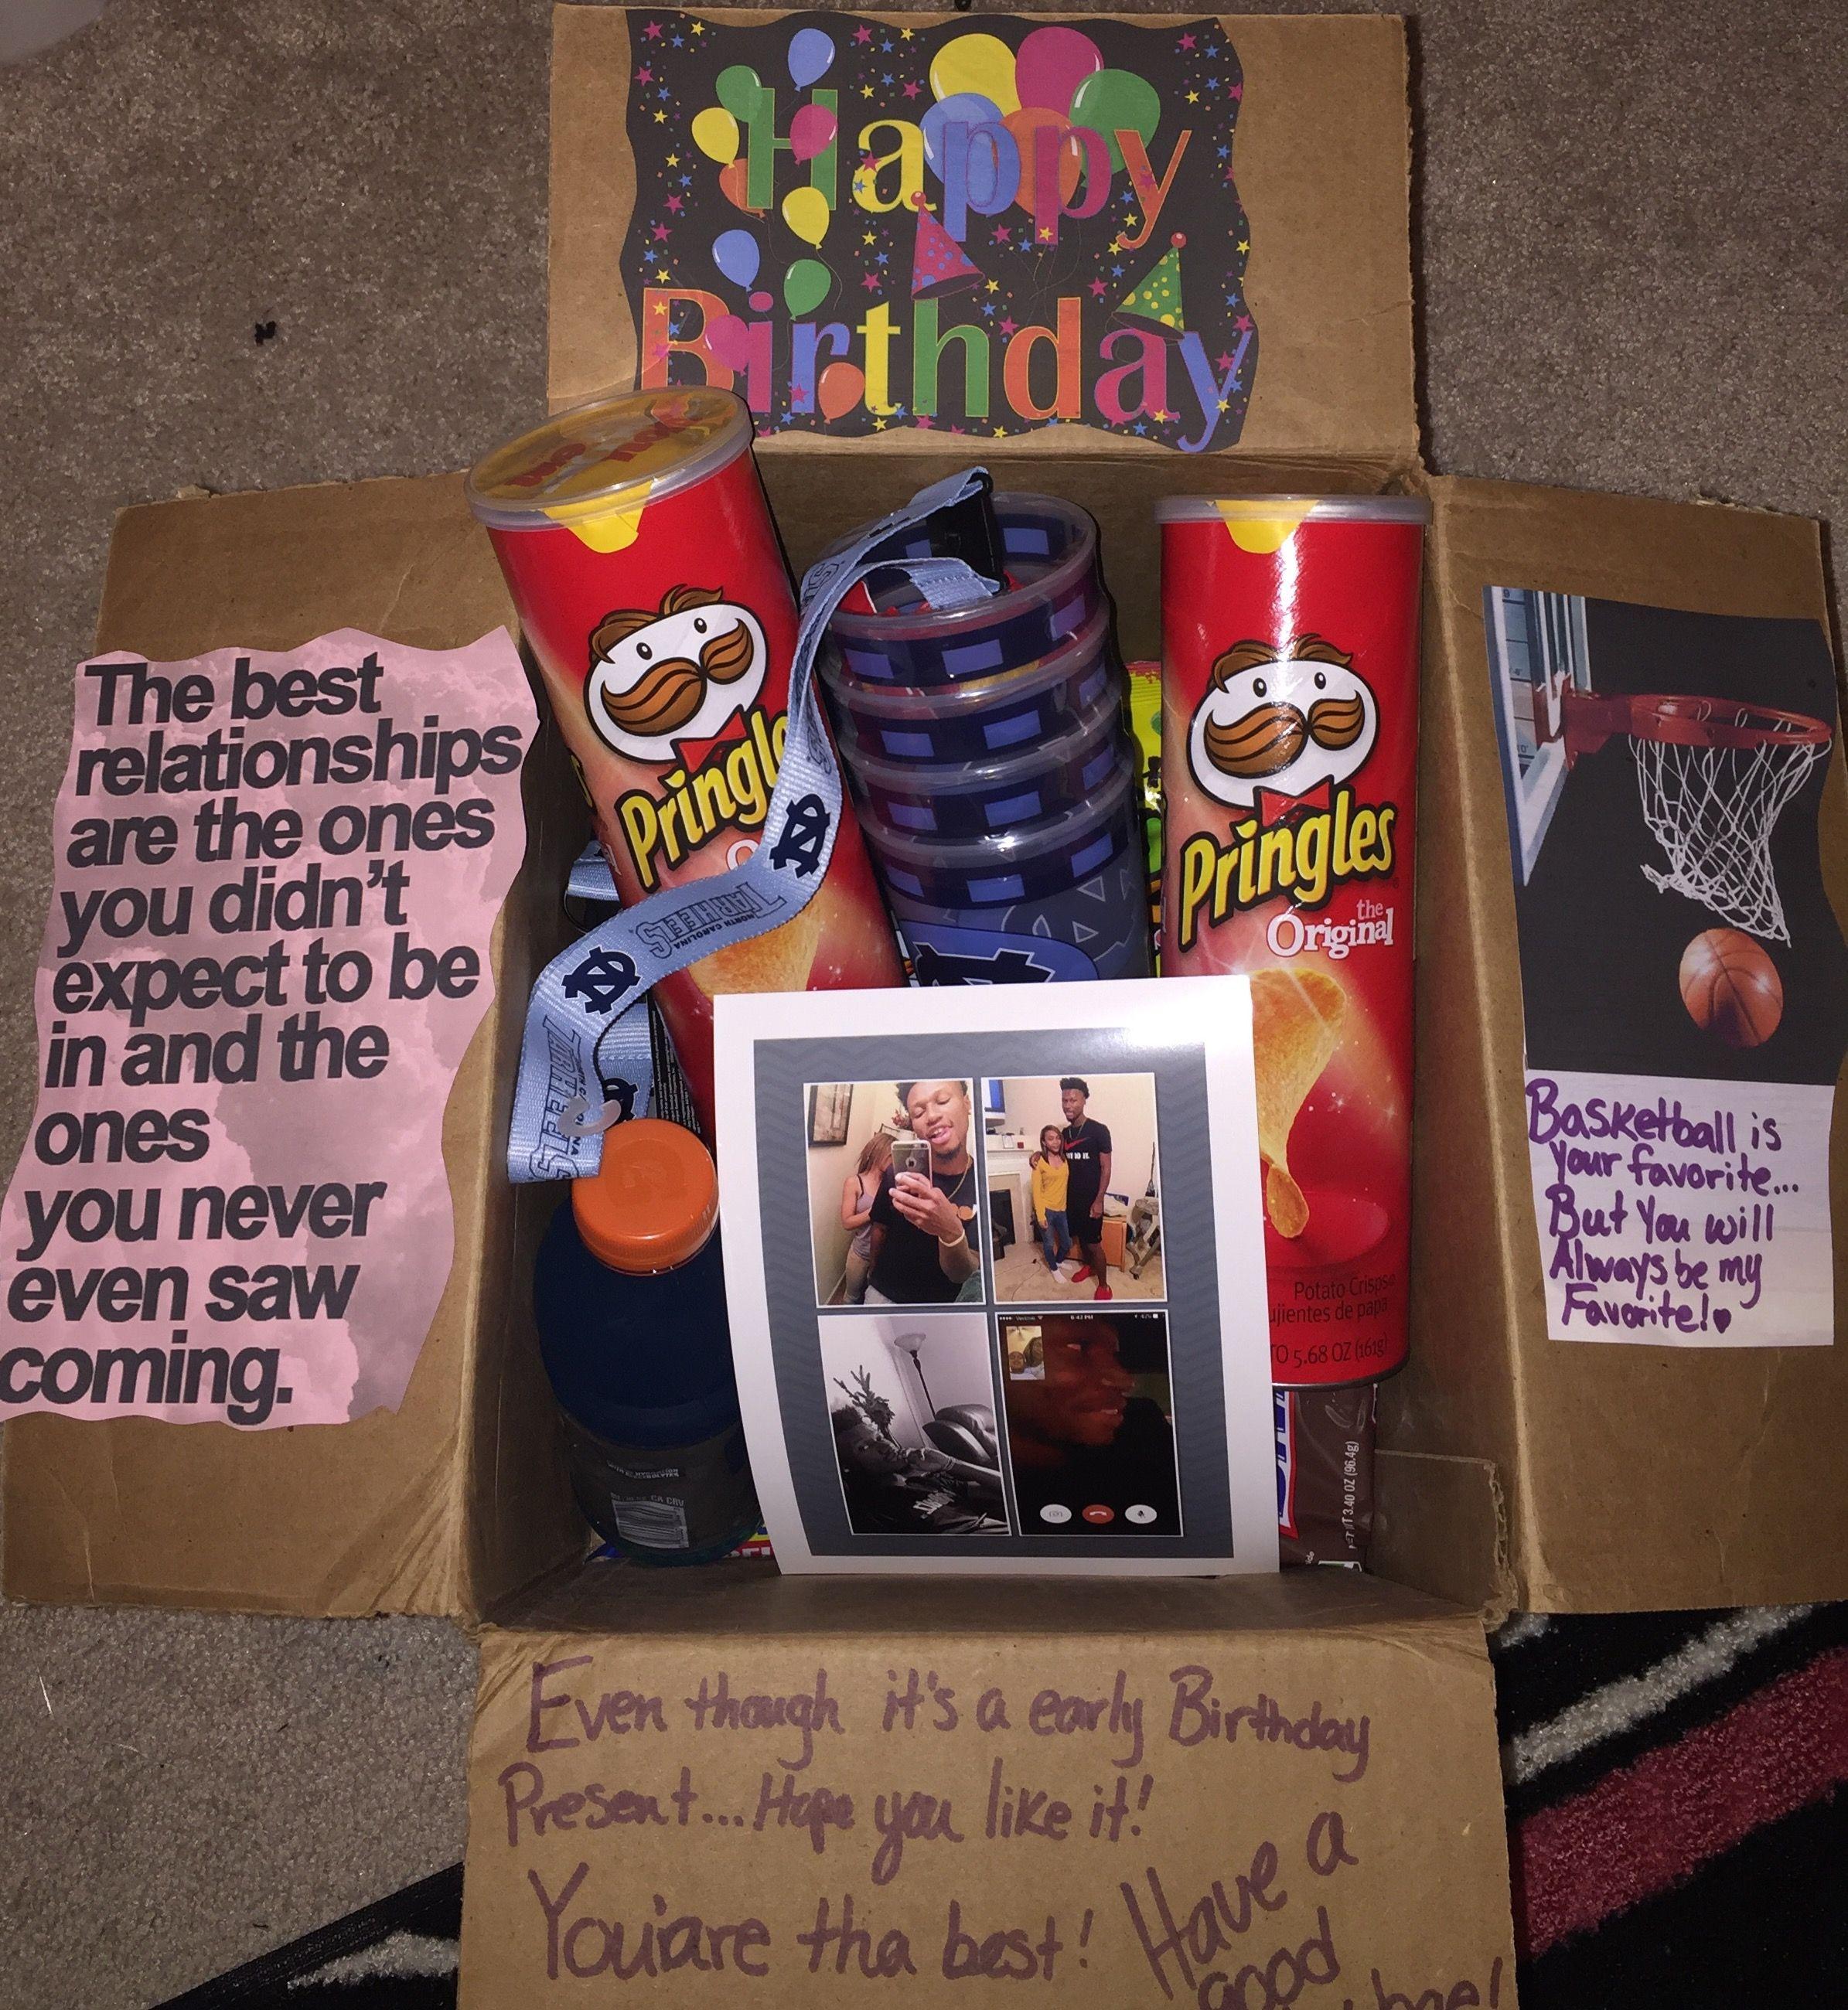 #BirthdaycareboxforBoyfriend Boyfriends Birthday Box